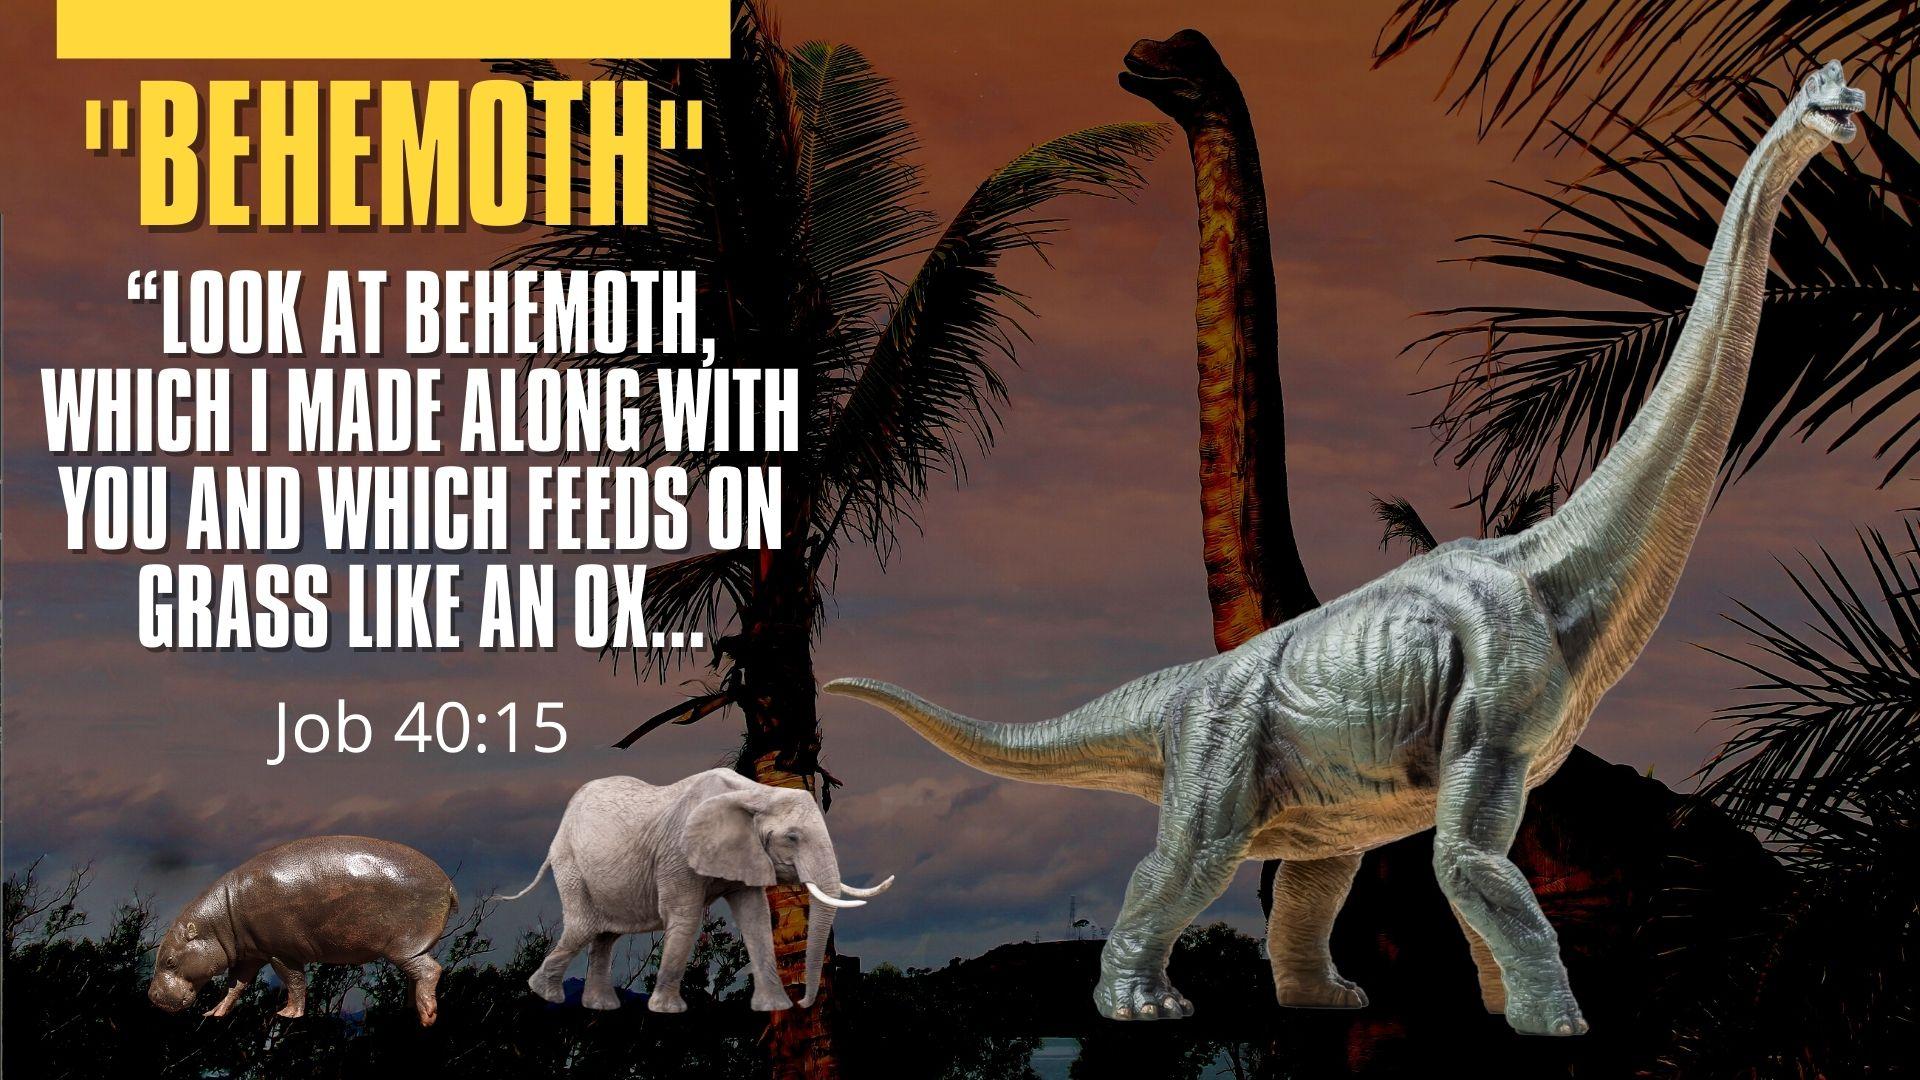 Behemoth.Job 40.15